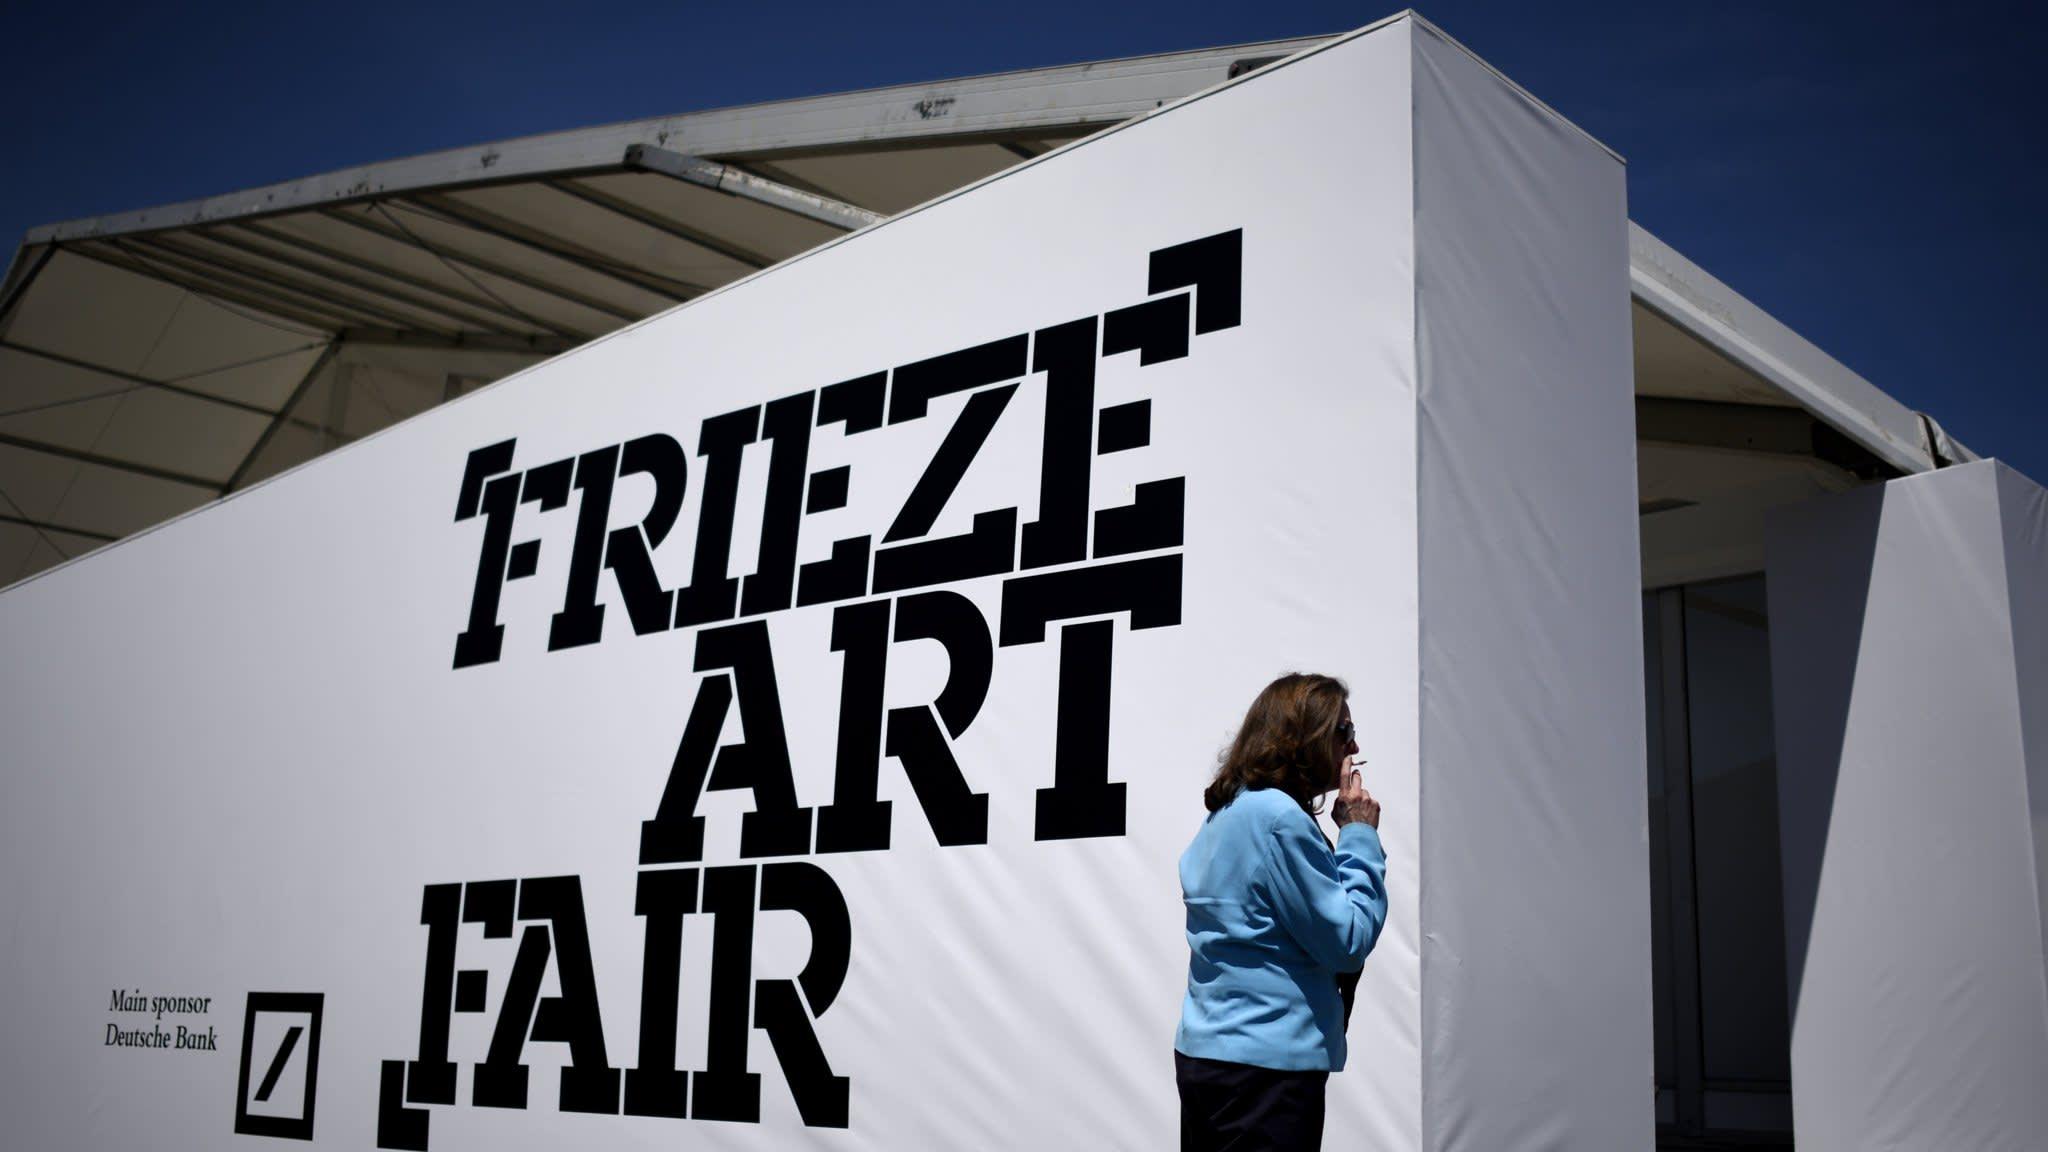 Frieze art fair to open in Los Angeles | Financial Times